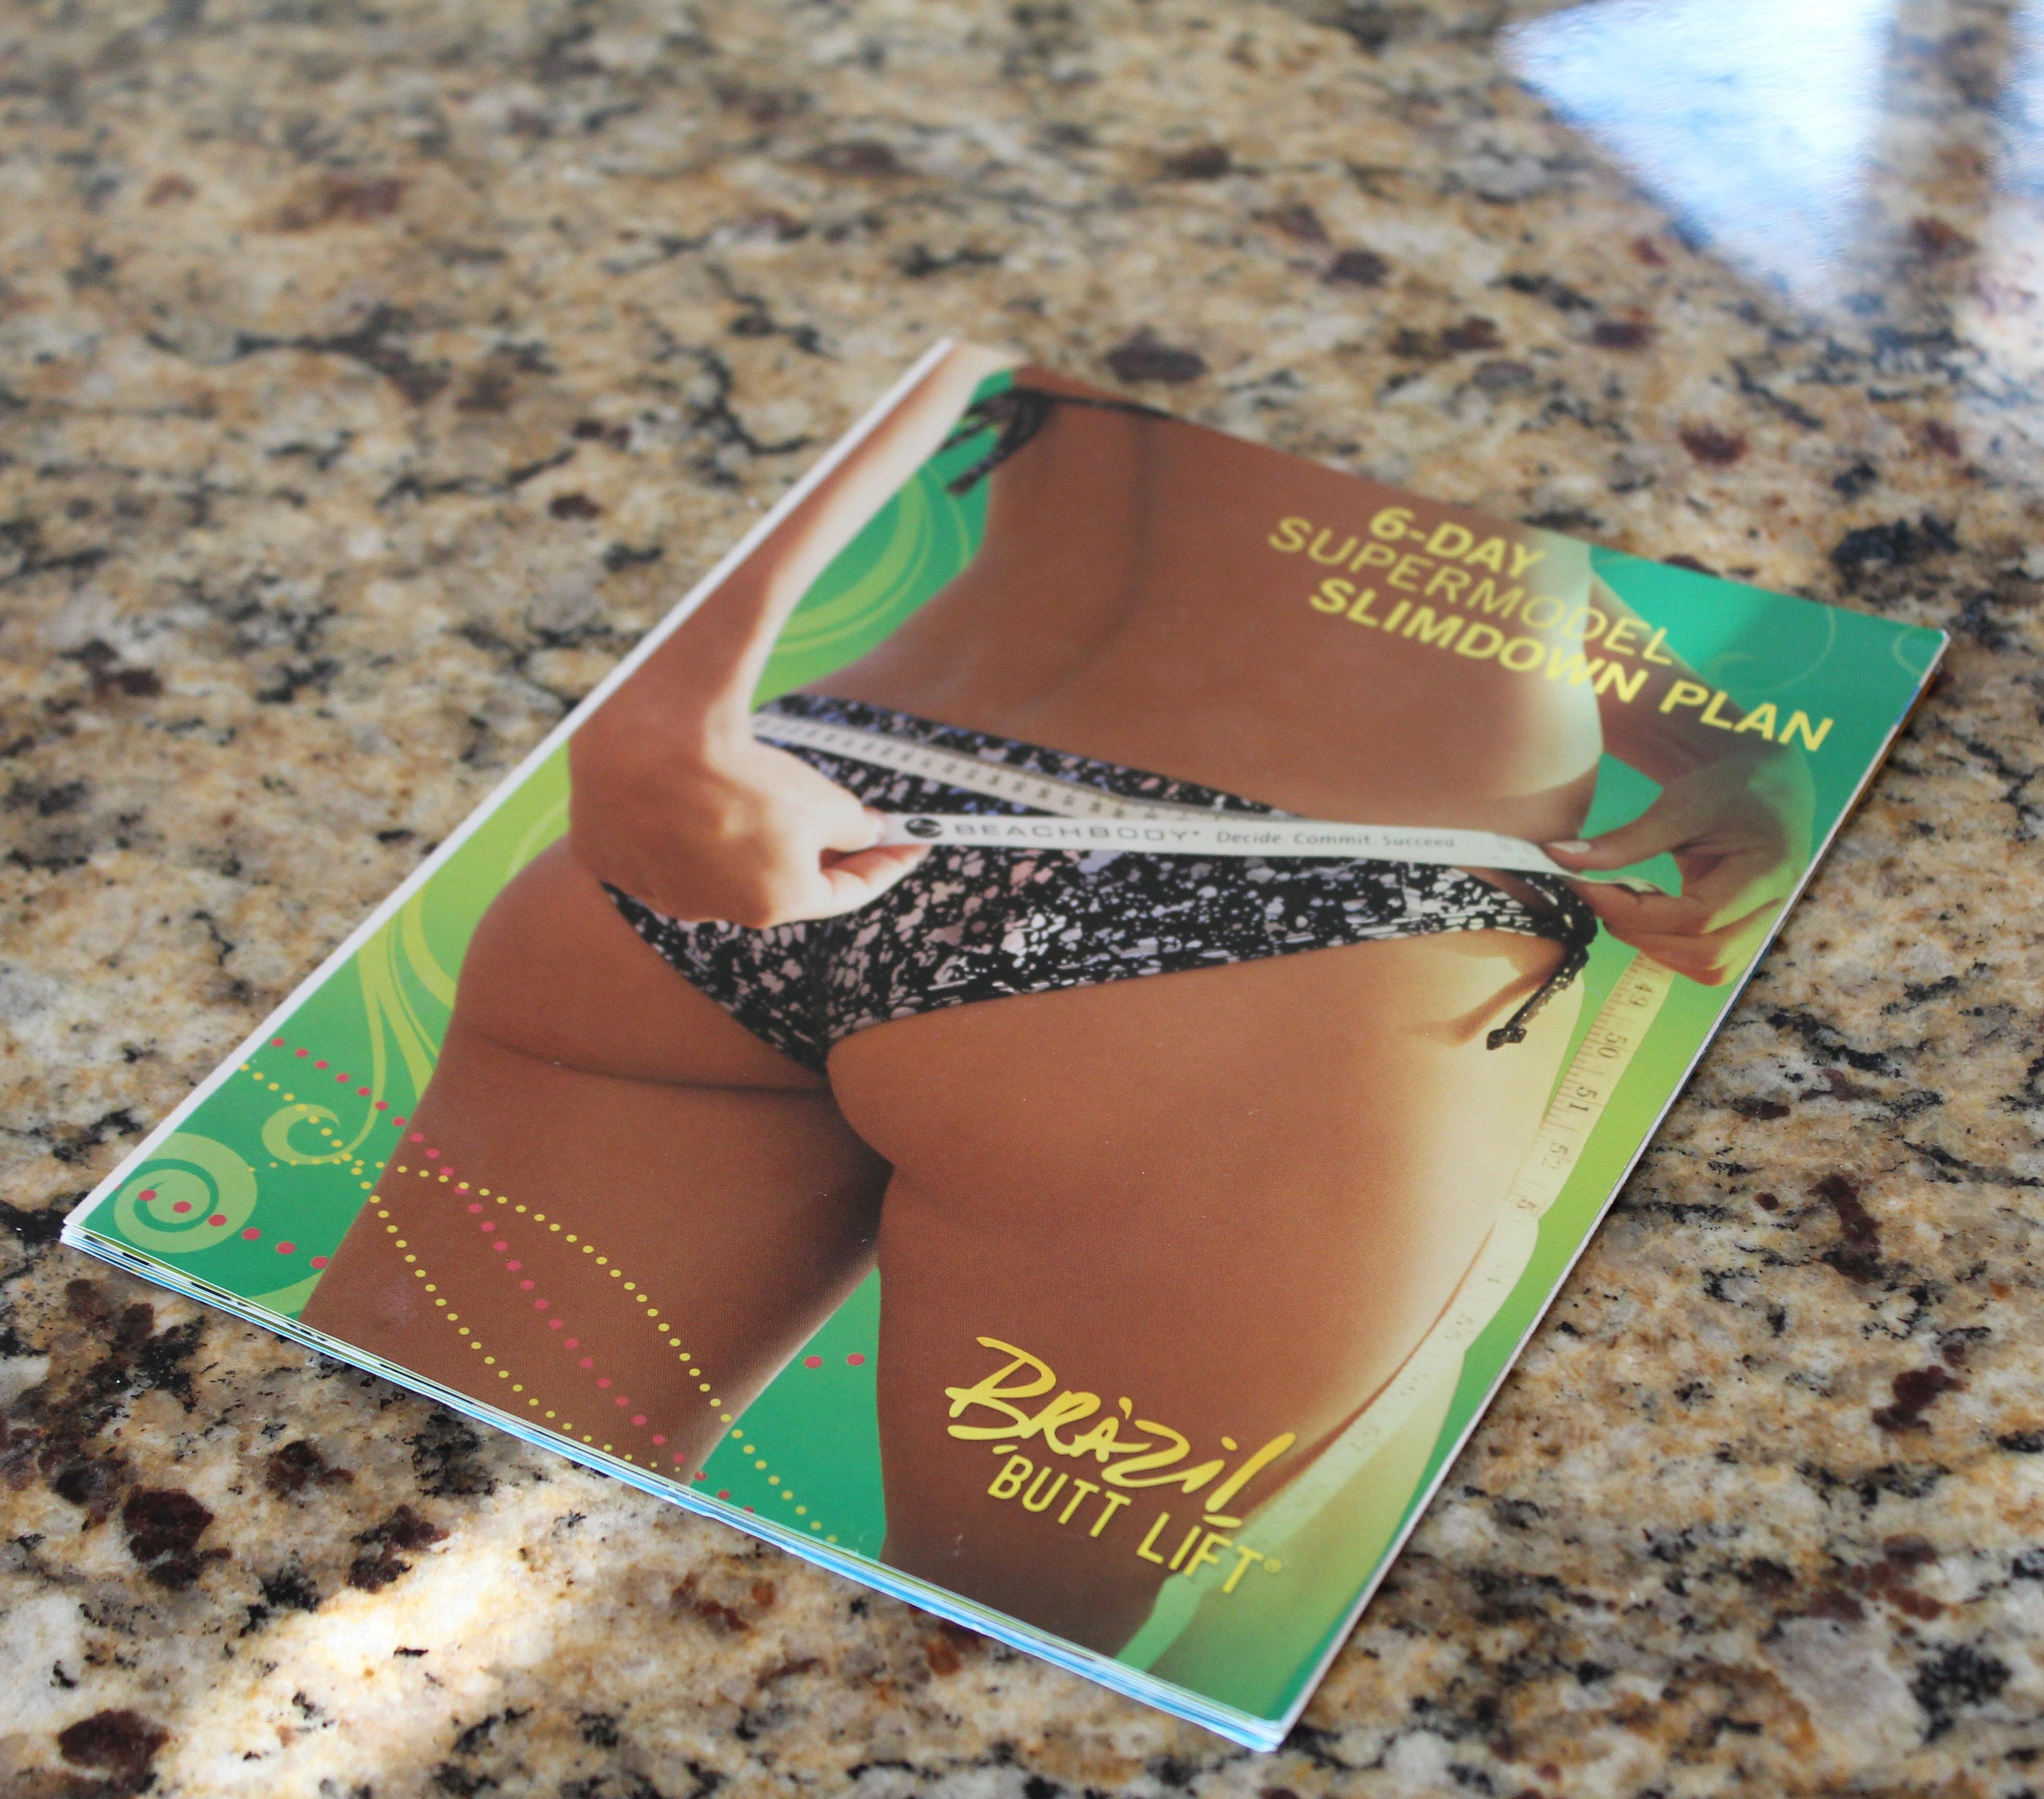 Brazil Butt Lift -6 day slim down